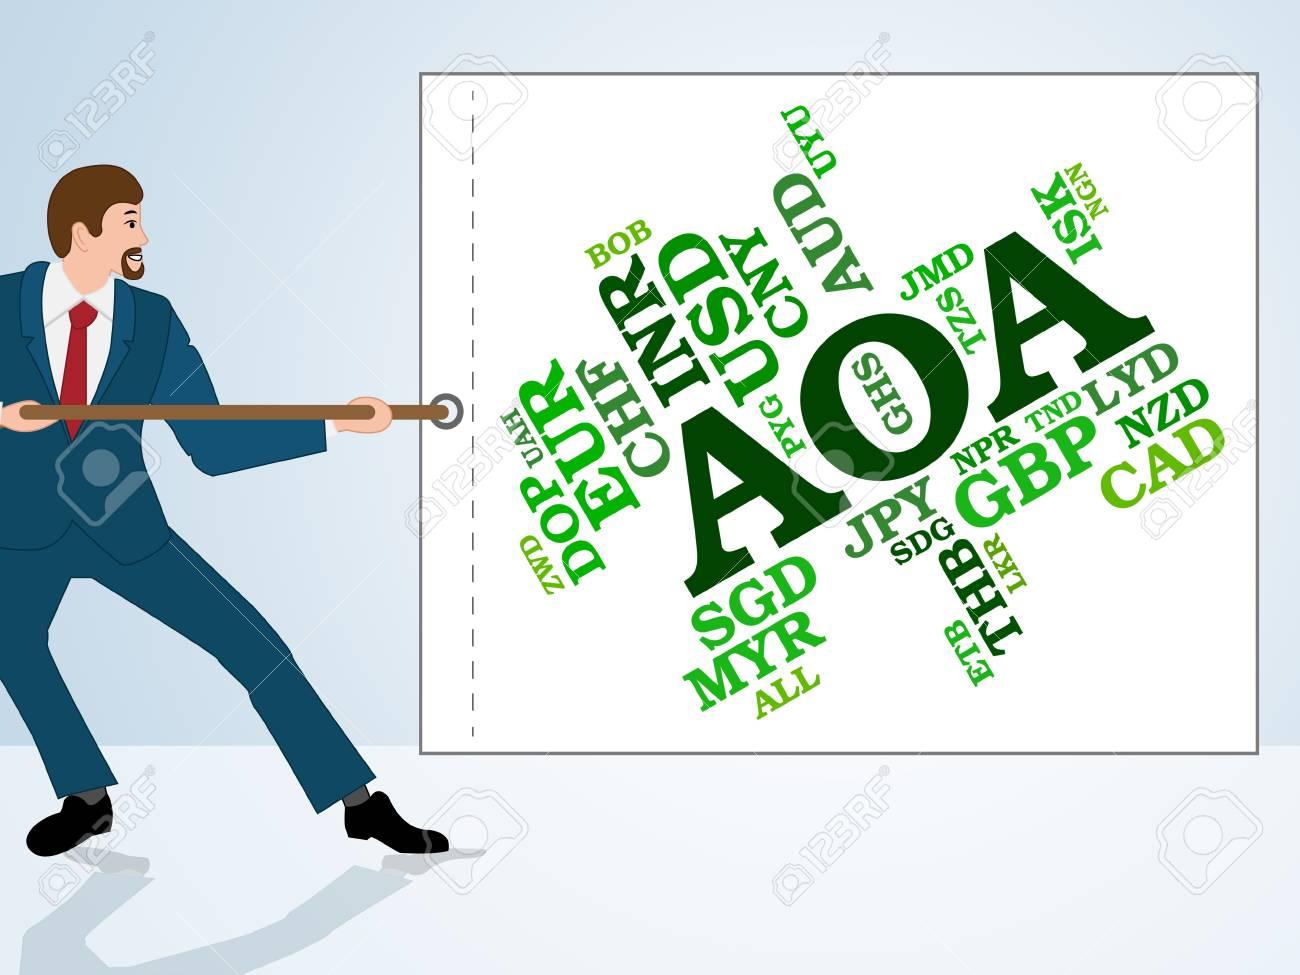 aoa currency representing worldwide